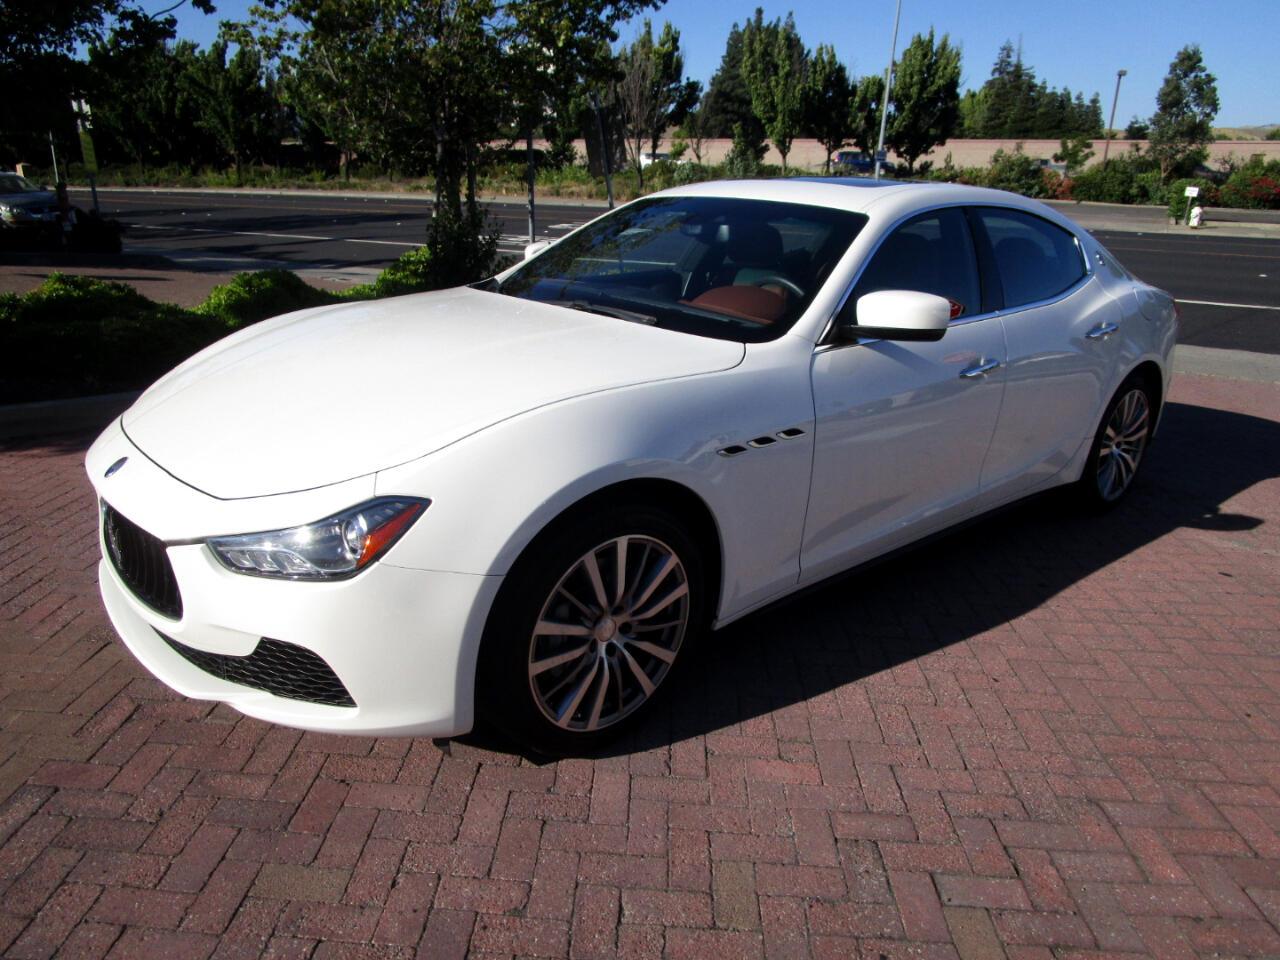 2016 Maserati Ghibli RWD PREMIUM PKG*NAV*SAT RADIO*HEAT SEATS*CAMERA**